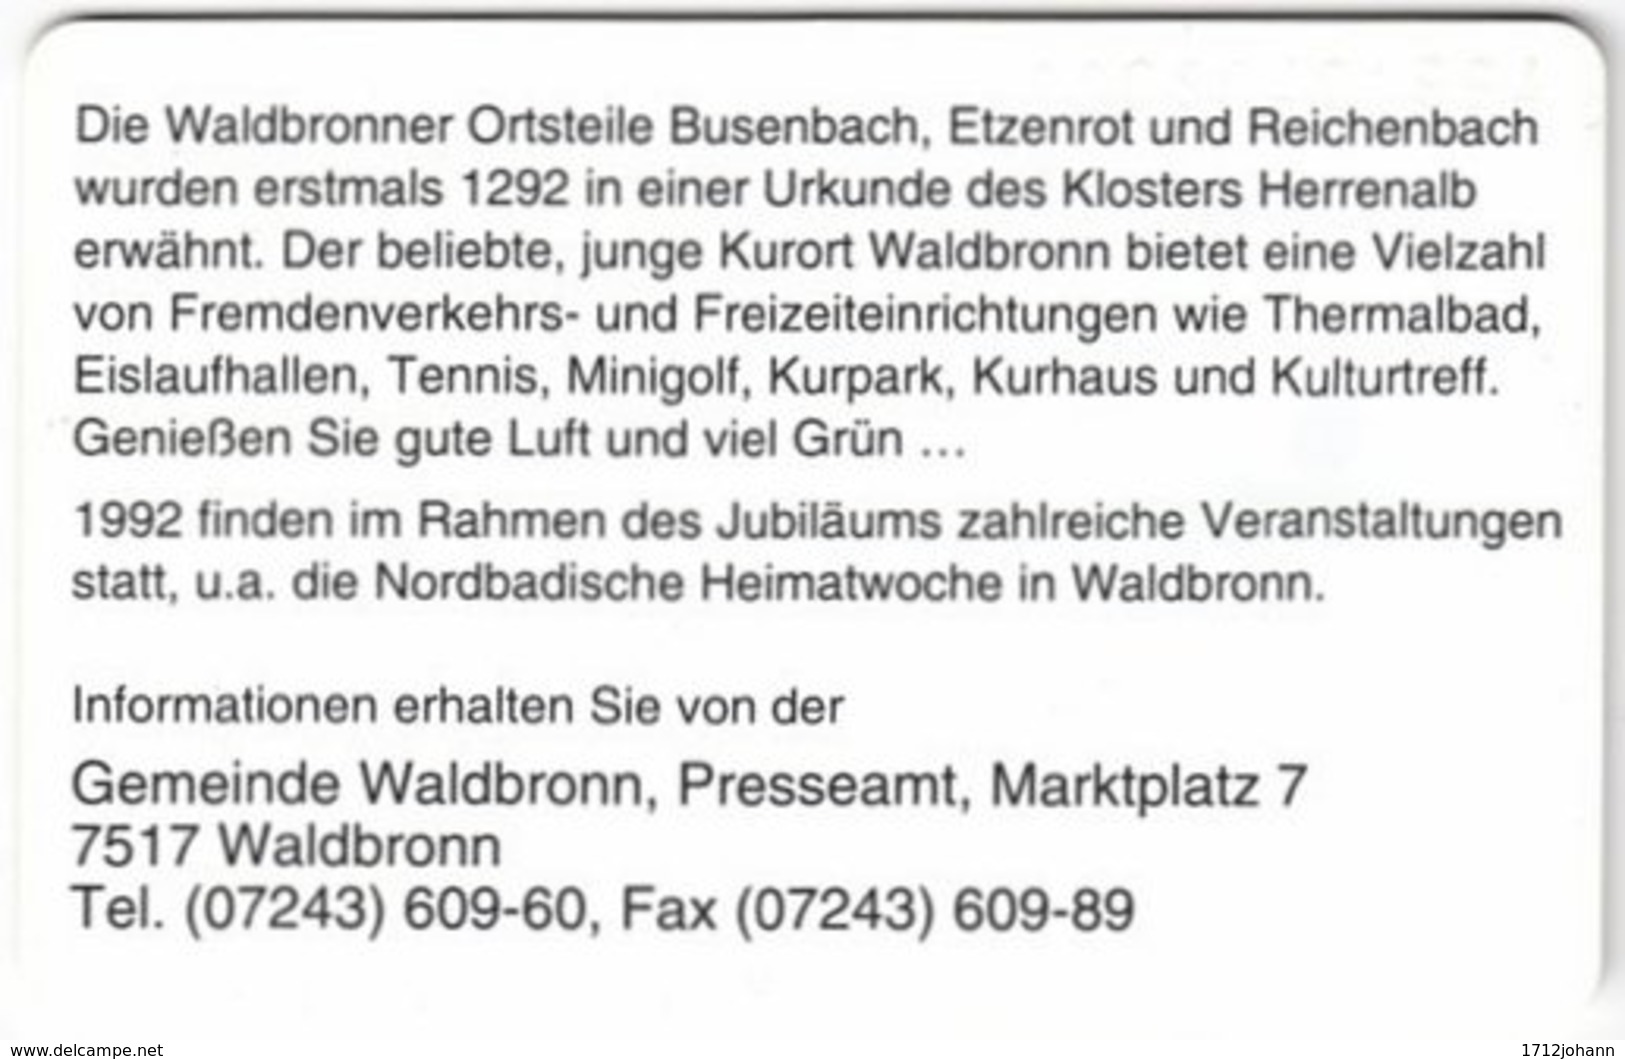 GERMANY O-Serie A-973 - 048 04.92 - MINT - O-Series: Kundenserie Vom Sammlerservice Ausgeschlossen